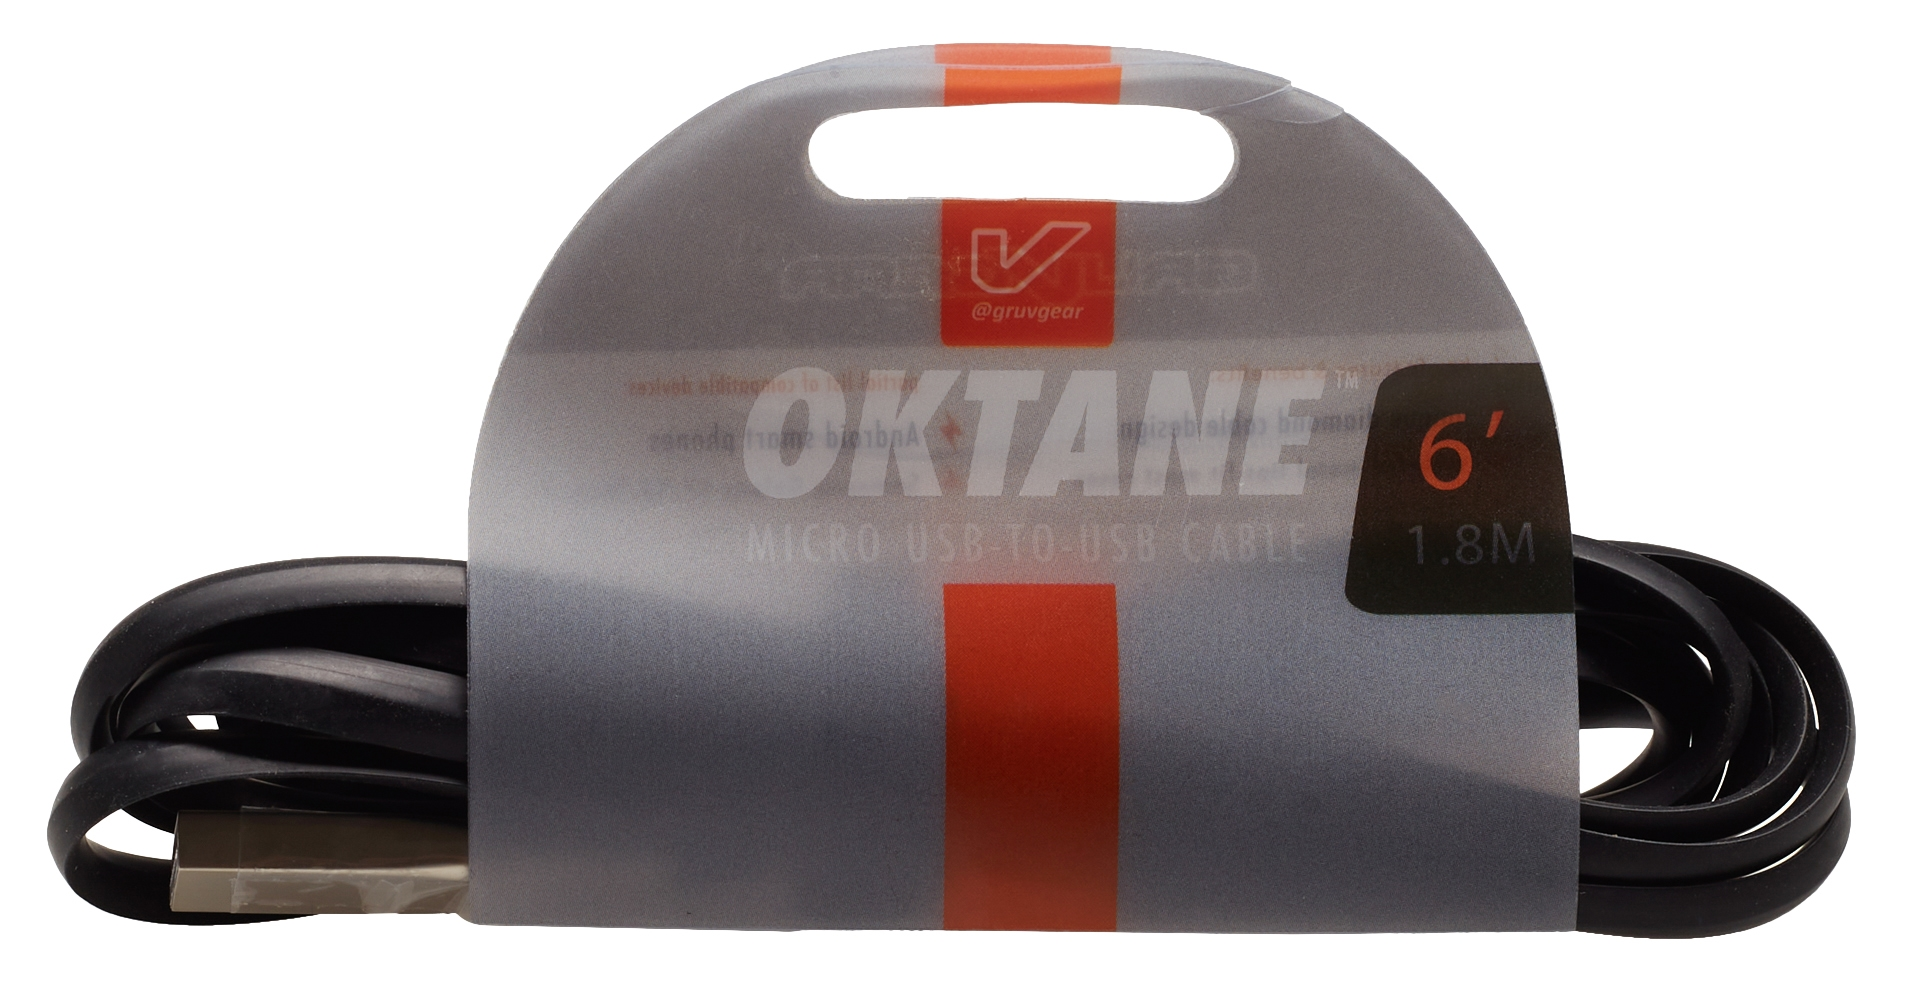 GRUVGEAR Oktane Charging Cable Micro USB 6'